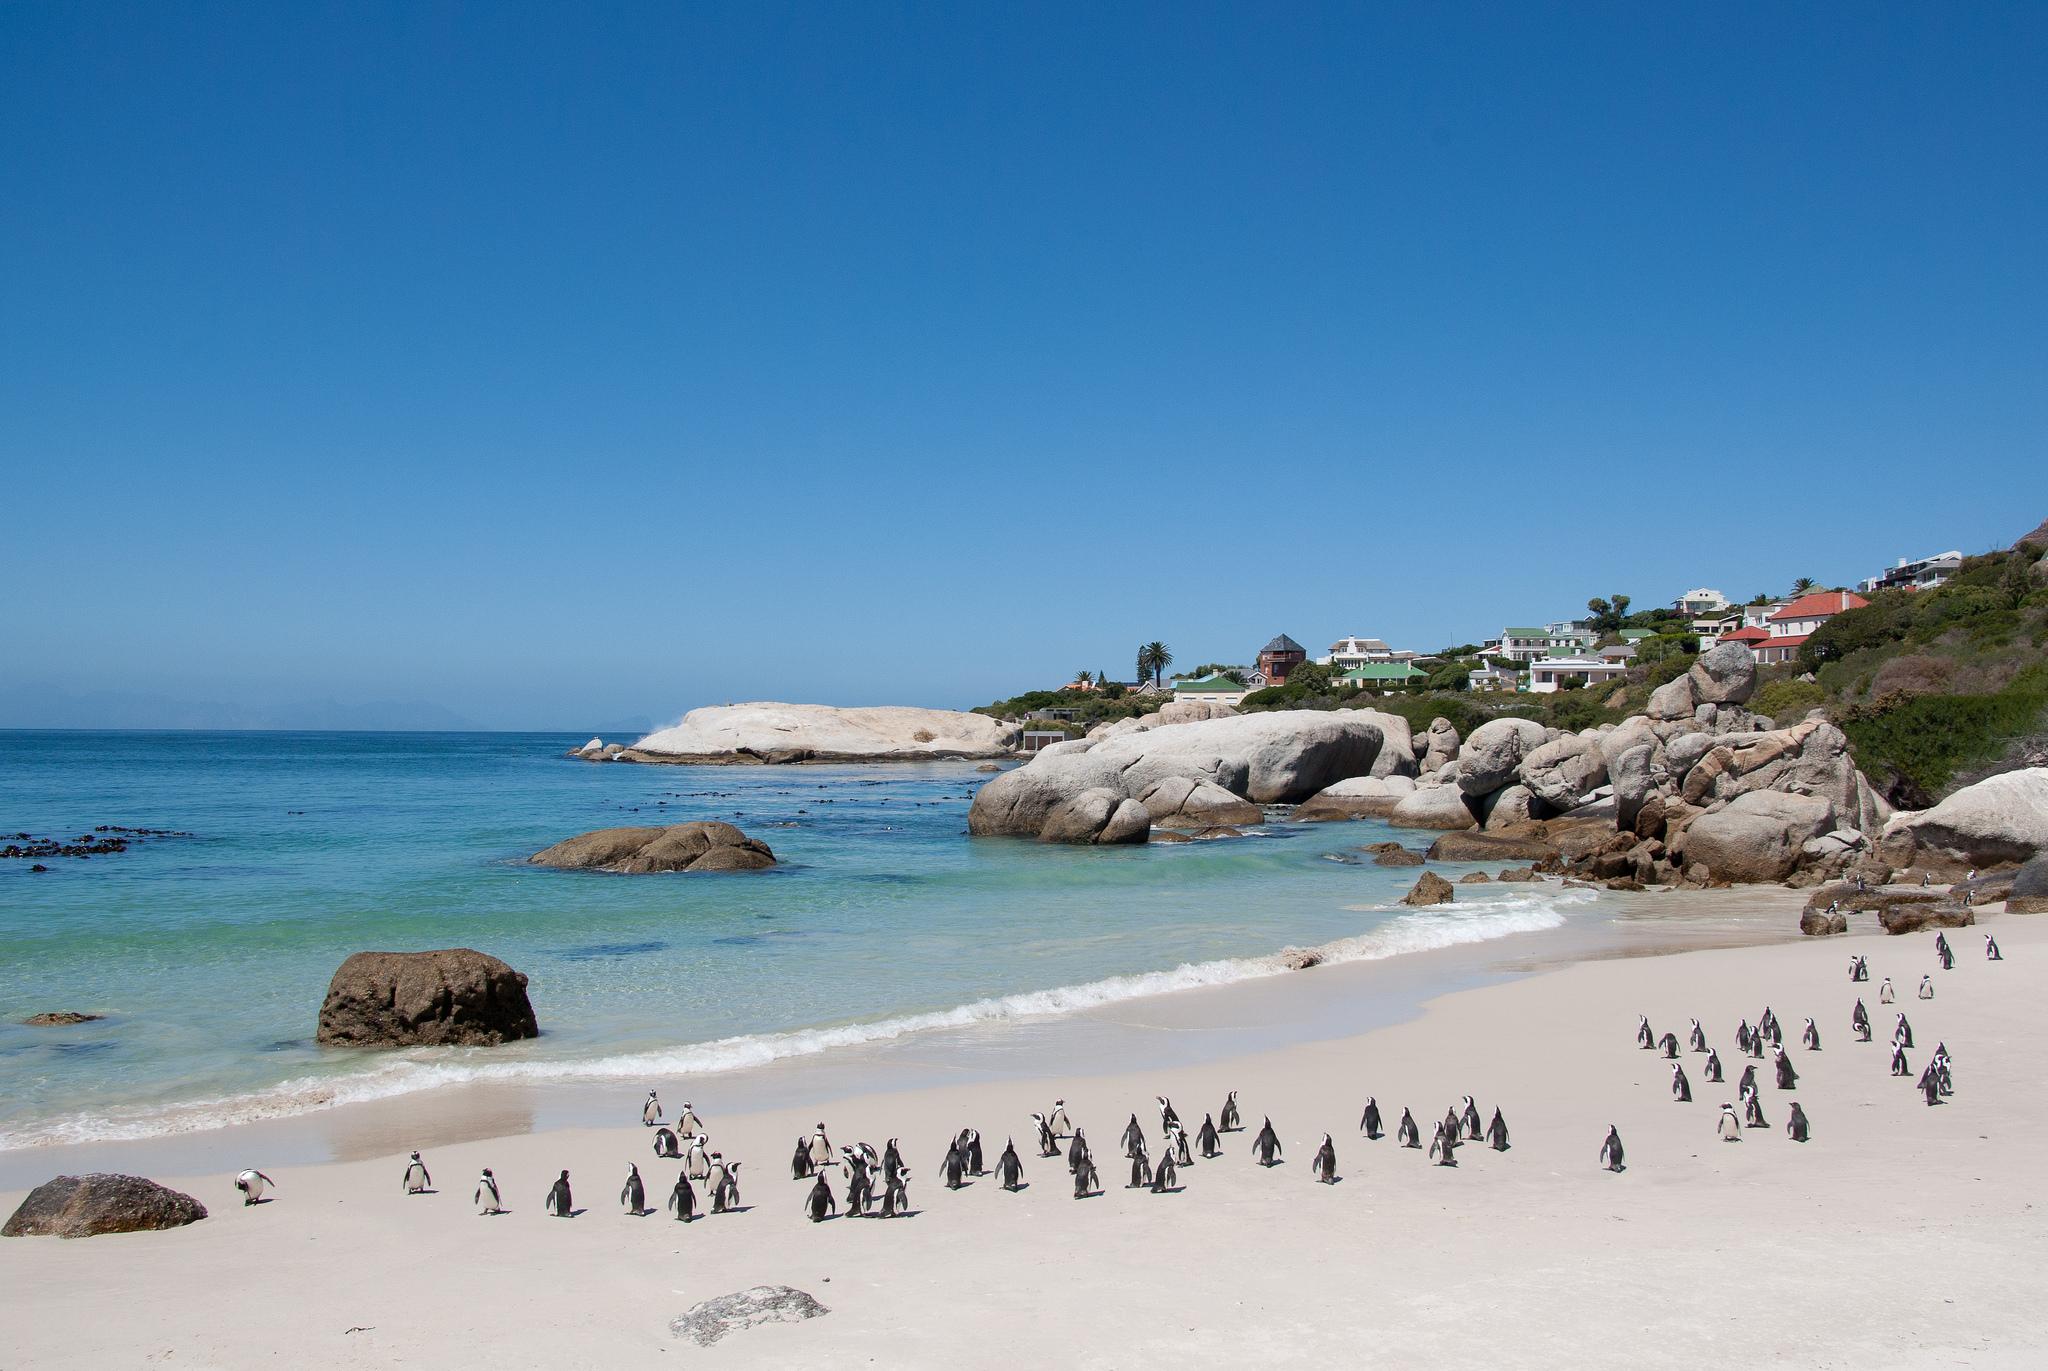 Mpumalanga Province Towns Boulders Beach Cape Town